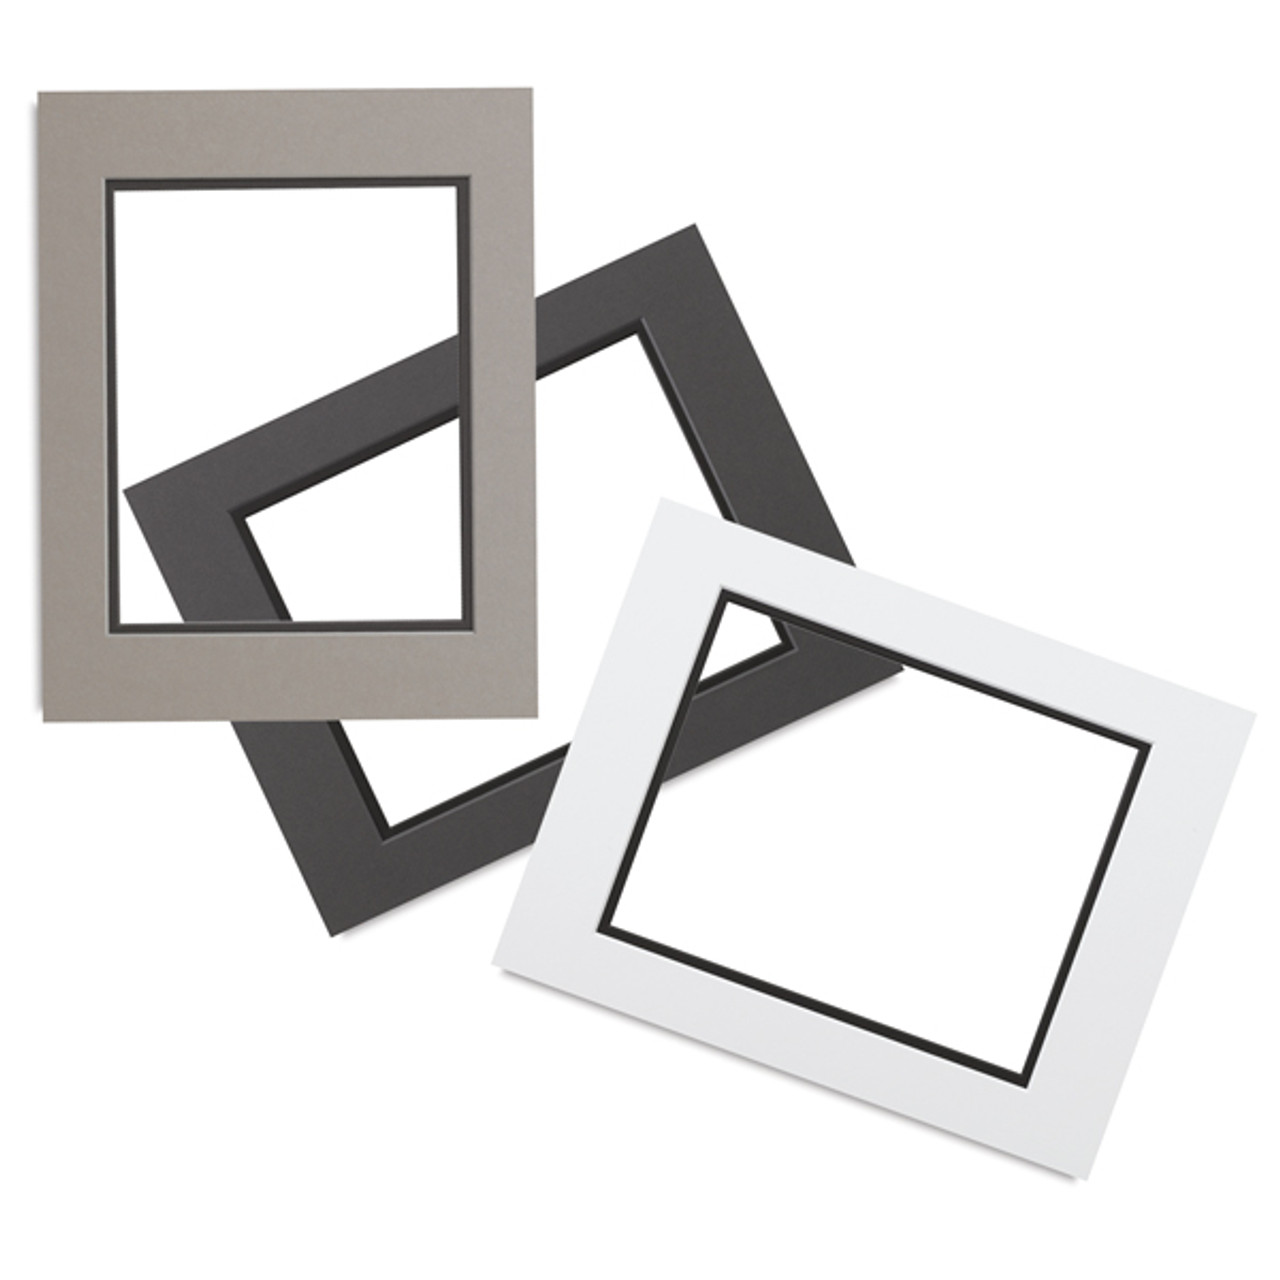 0060 White Core Double Mats 20 X 24 For 16 X 20 Artwork